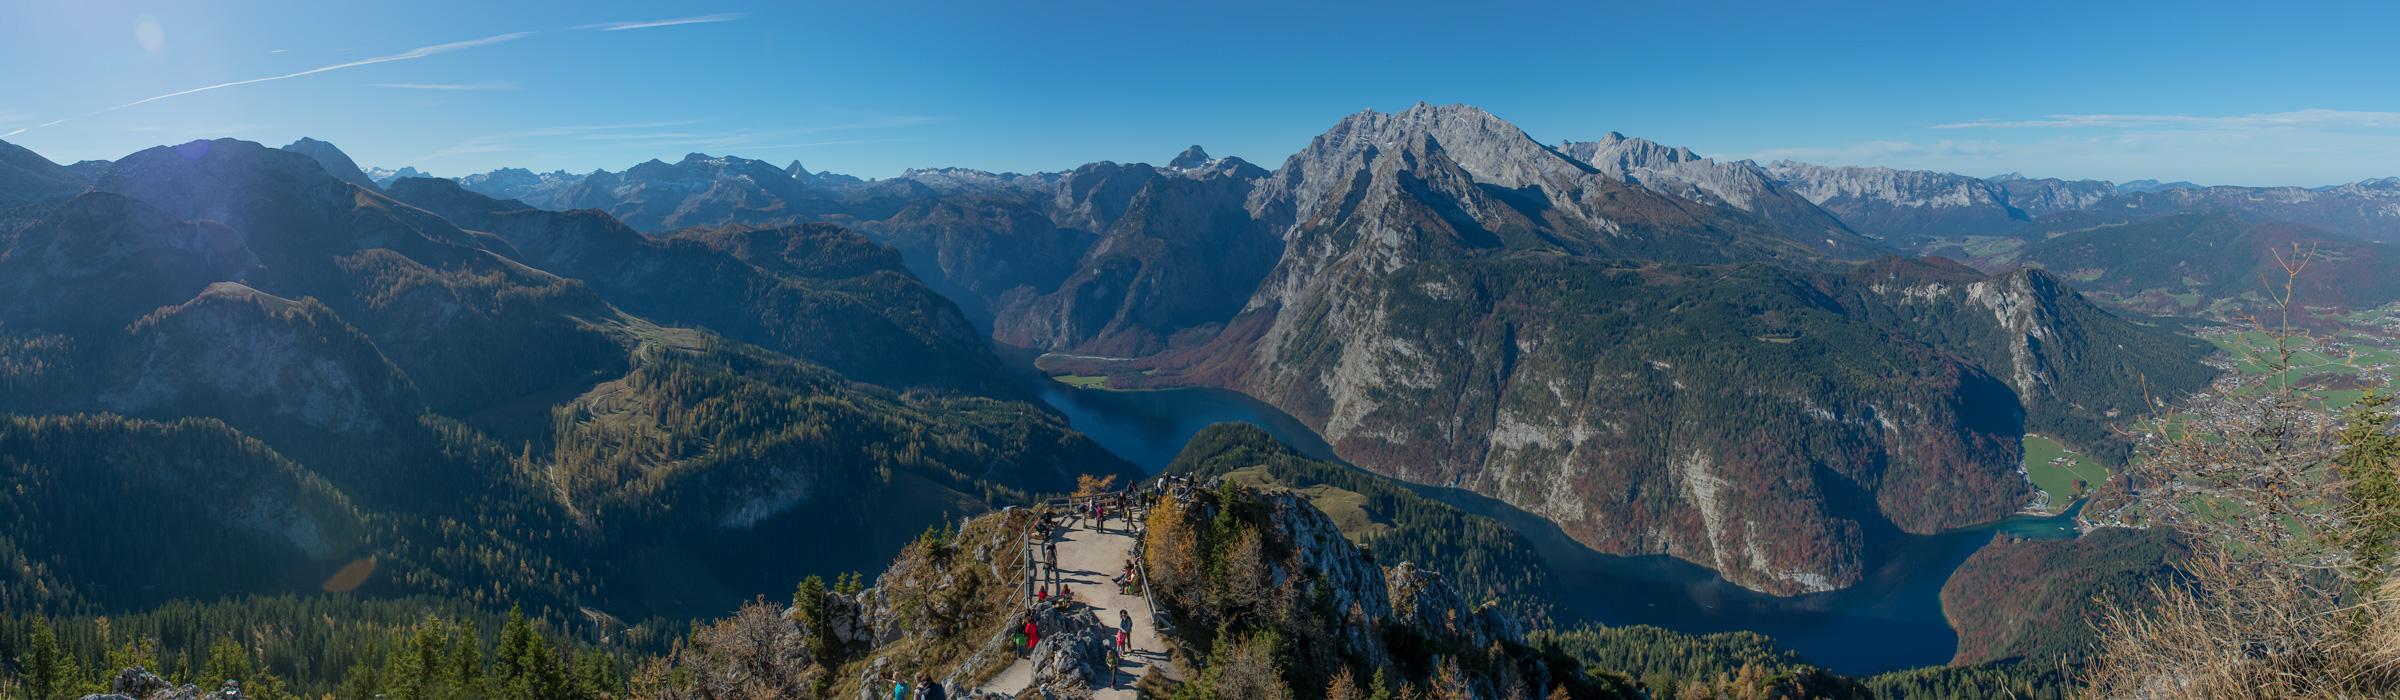 Panoramaufnahme der Landschaft in Berchtesgaden